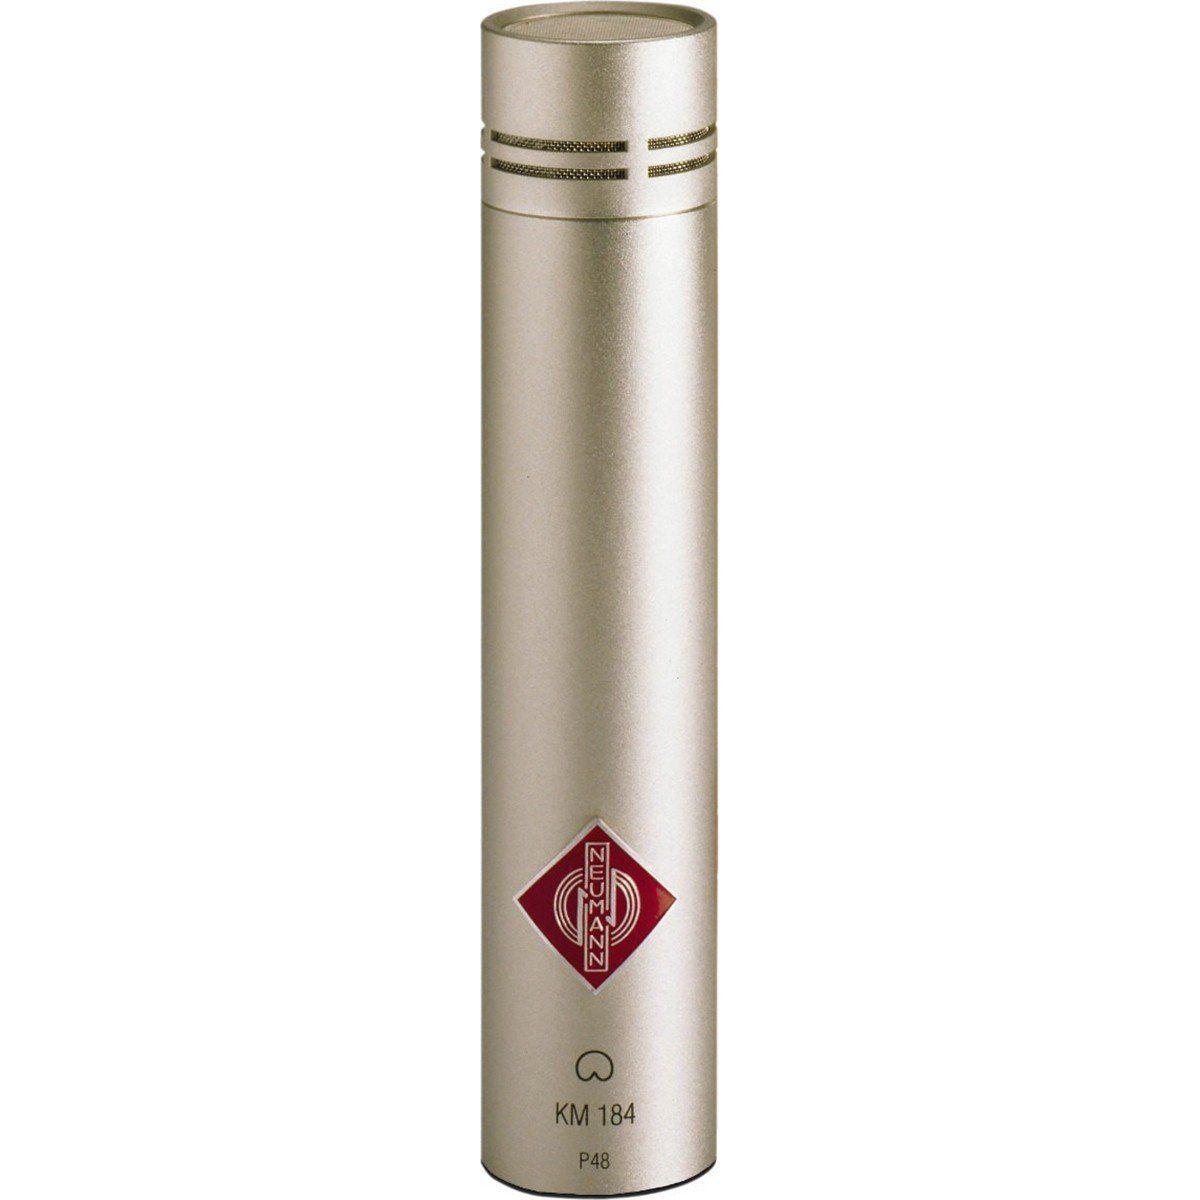 Neumann KM 184 NI Microfone Cardioide Condensador Neumann KM 184-NI Profissional